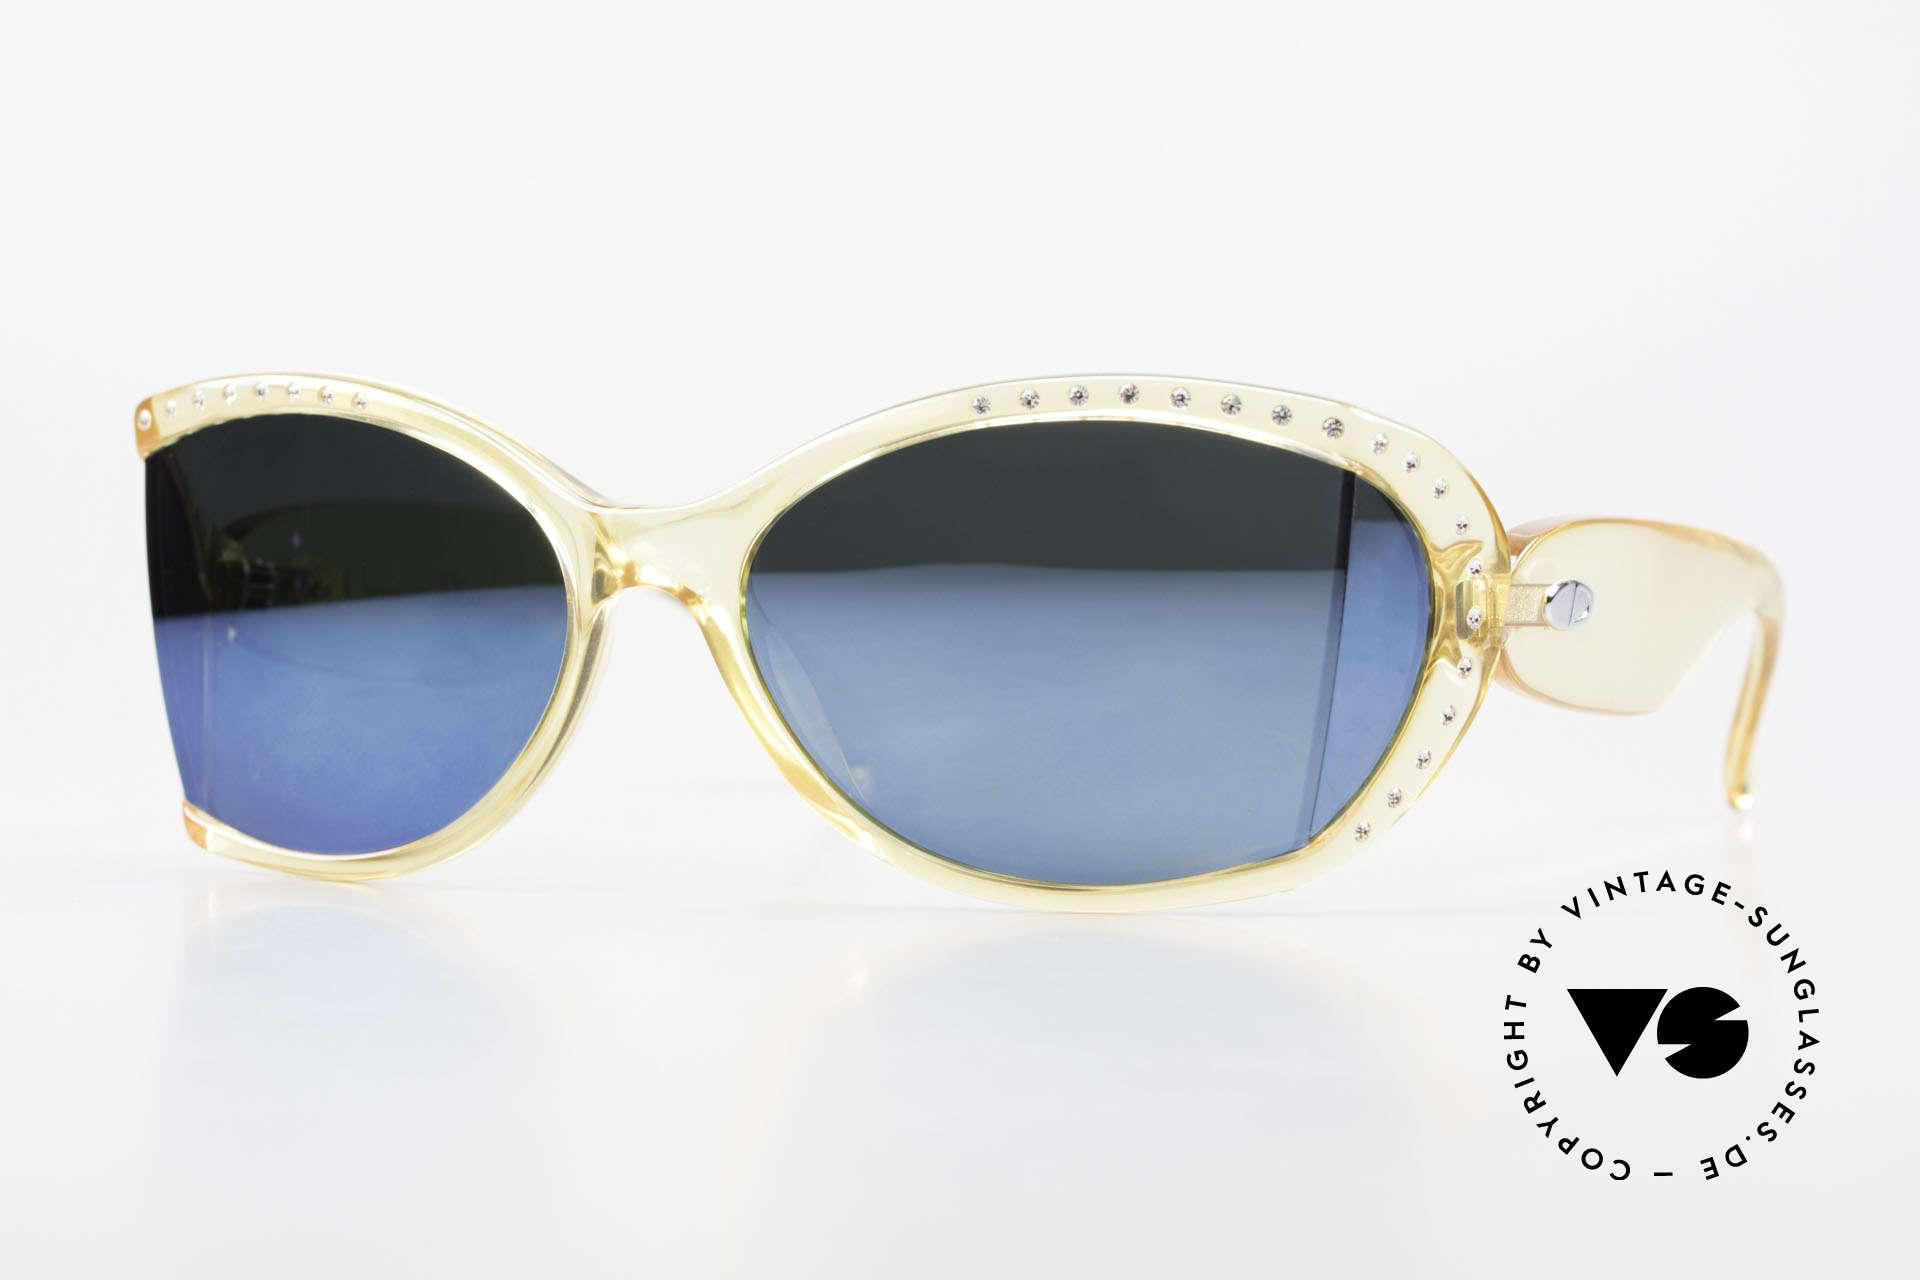 Christian Dior 2439 80's Crystal Sunglasses Gem, futuristic Christian Dior ladies sunglasses from 1989, Made for Women